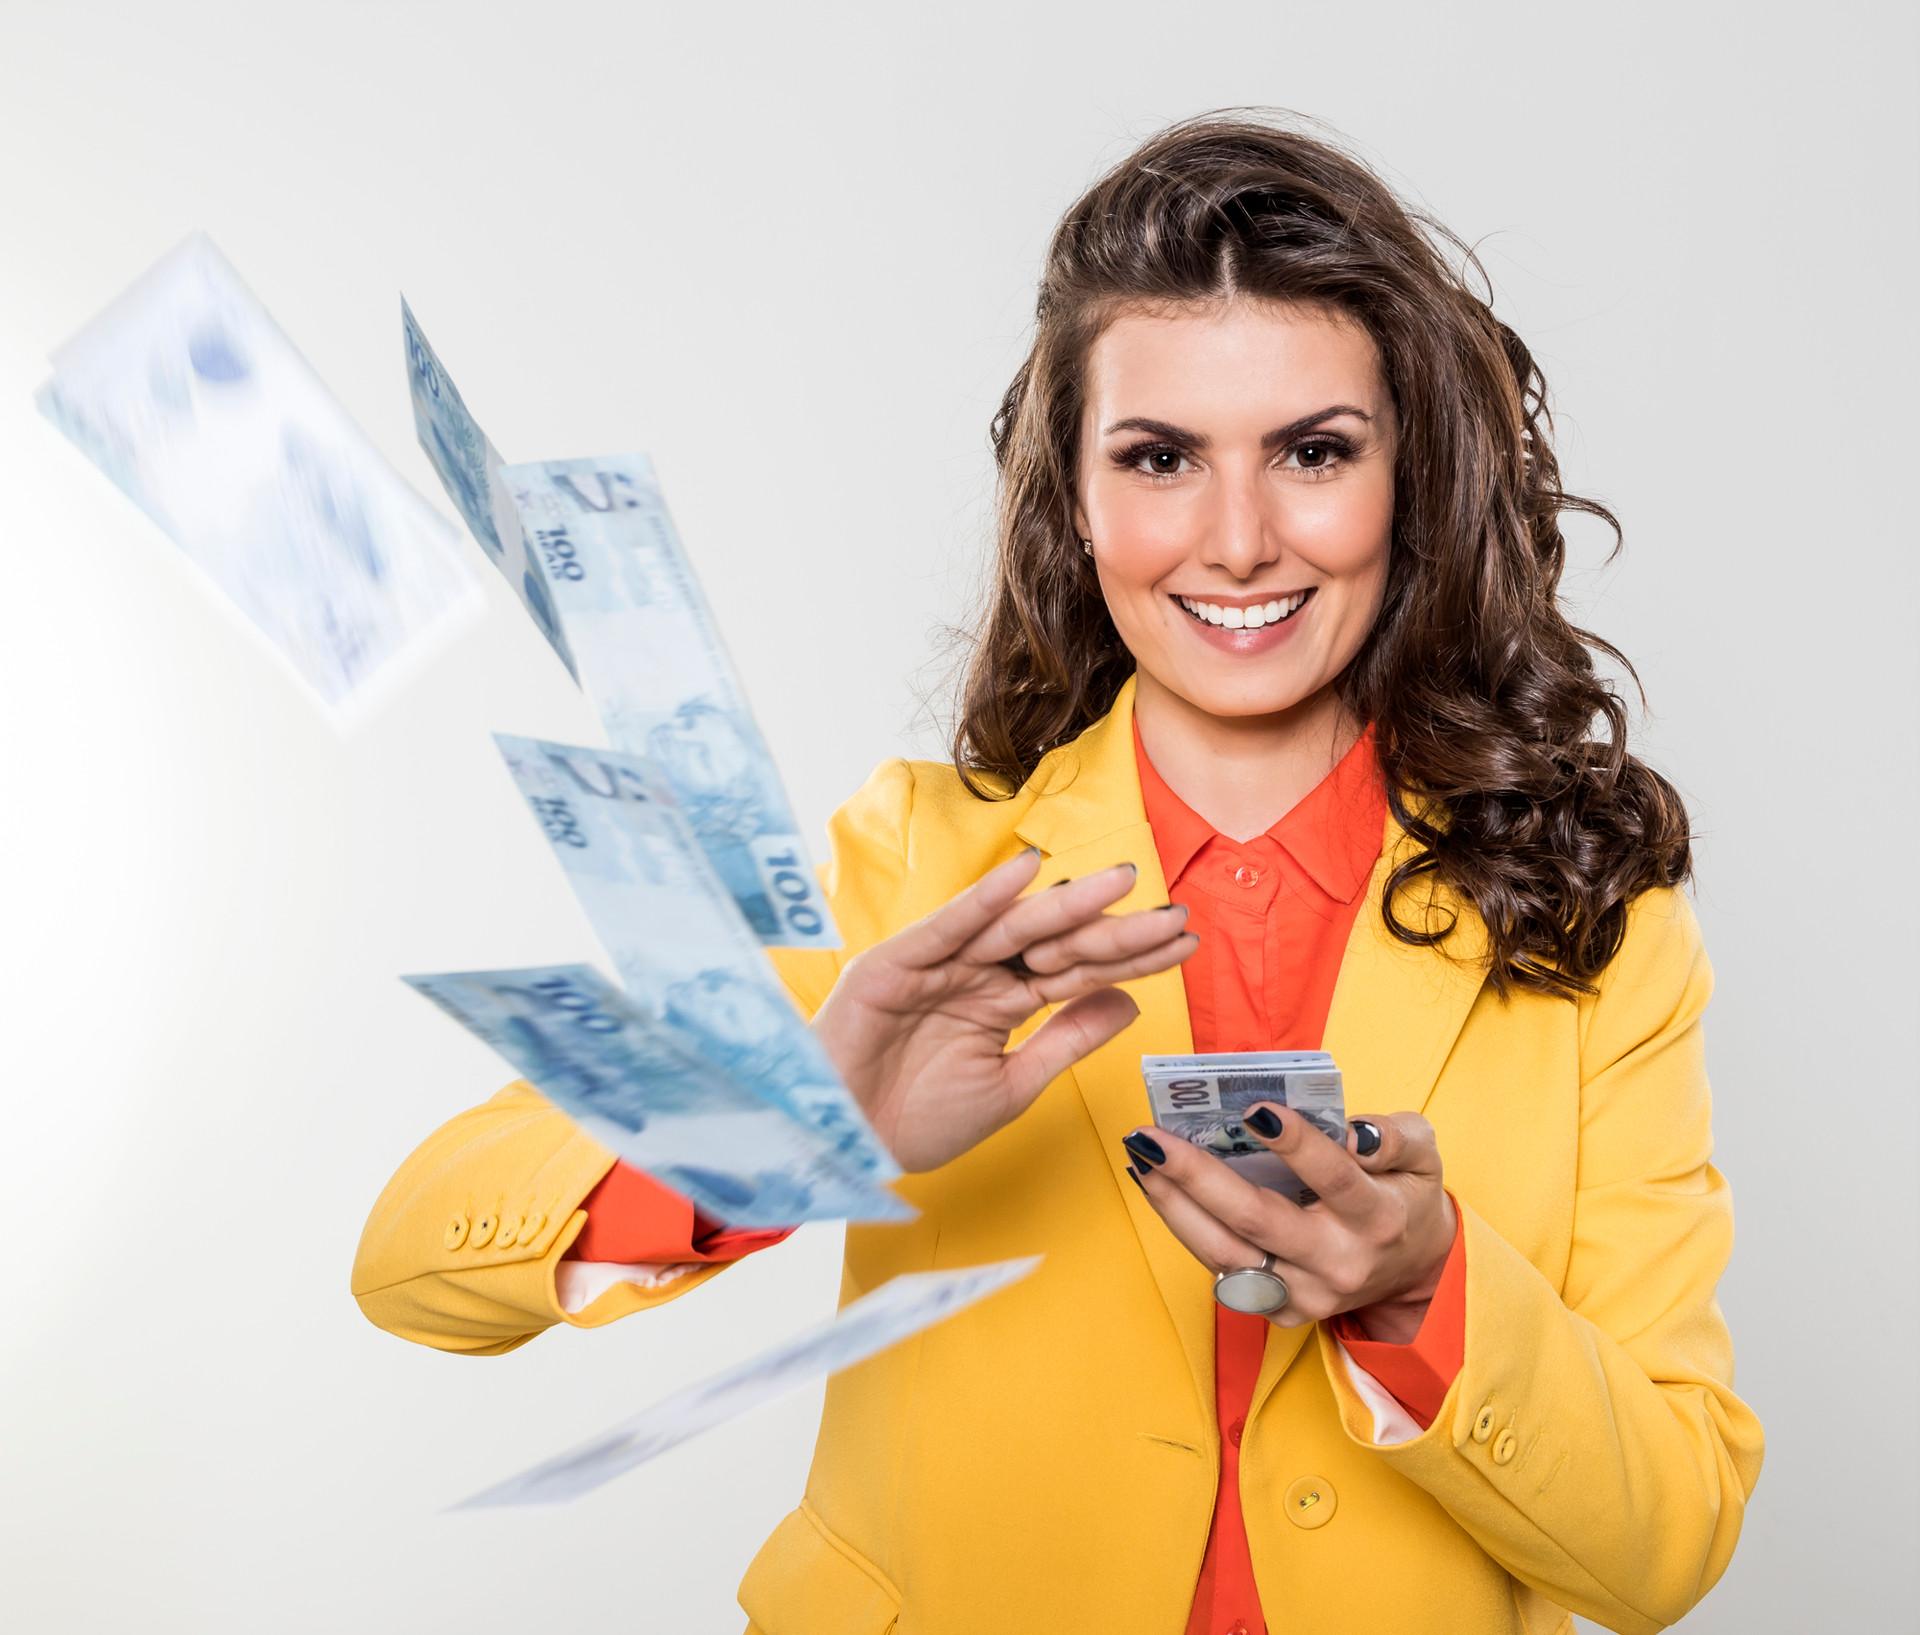 Business portrait of Nathalia Arcuri